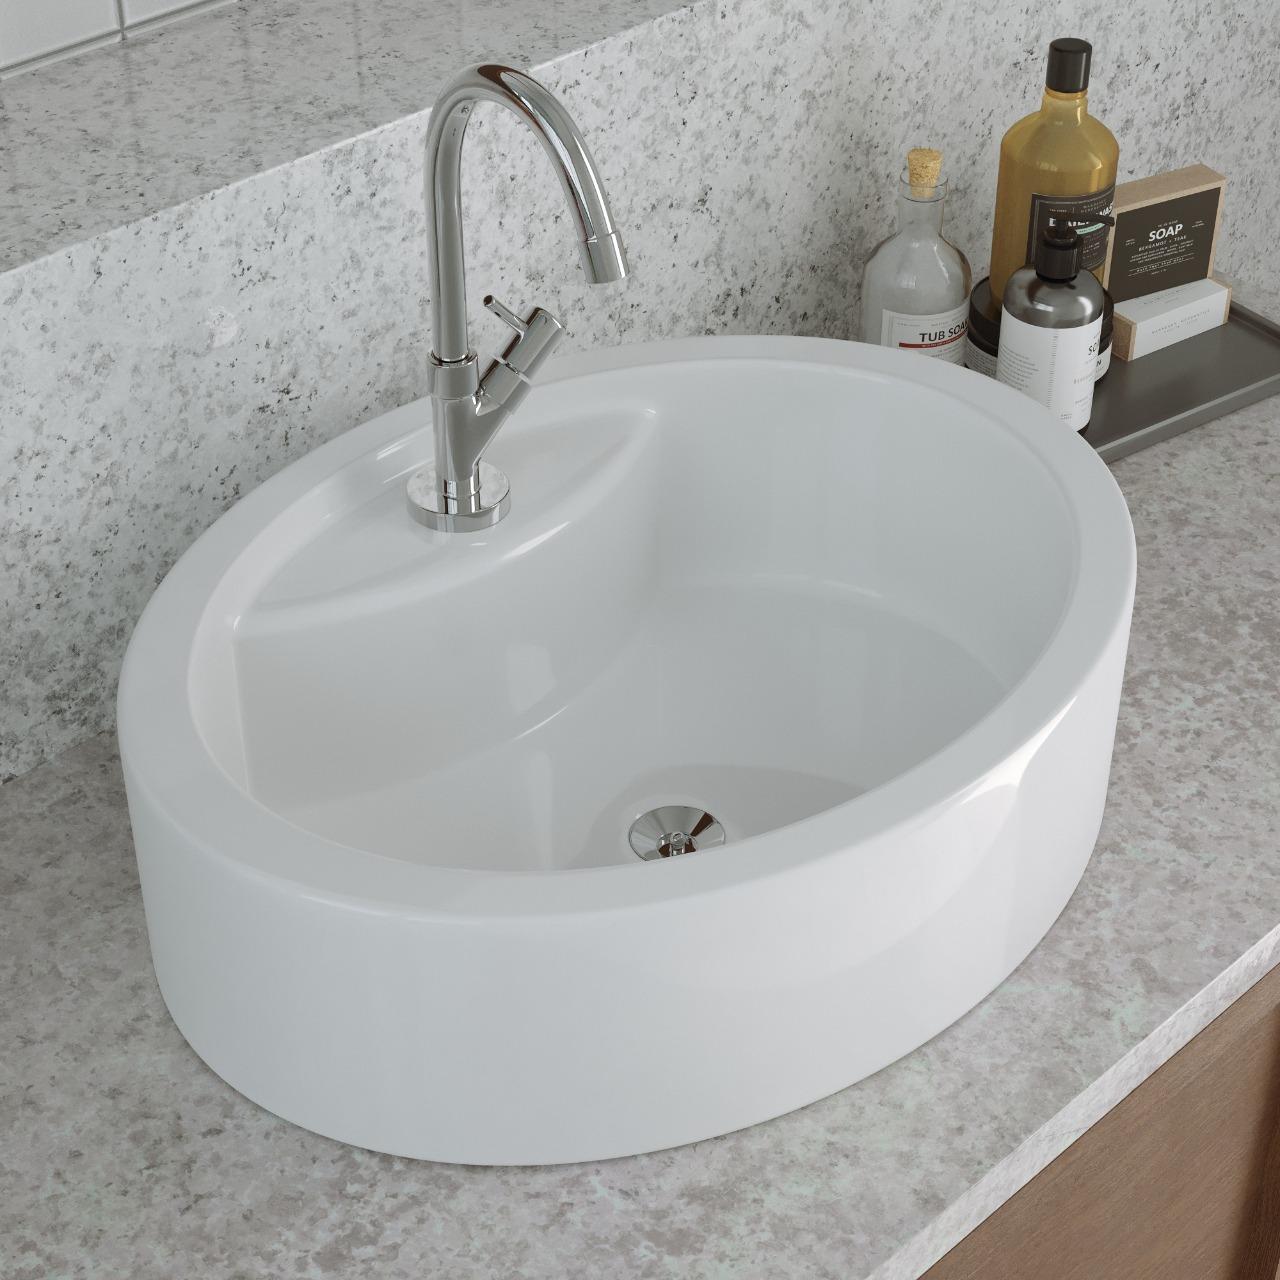 Cuba De Apoio Para Banheiro Modelo Florença 44x34